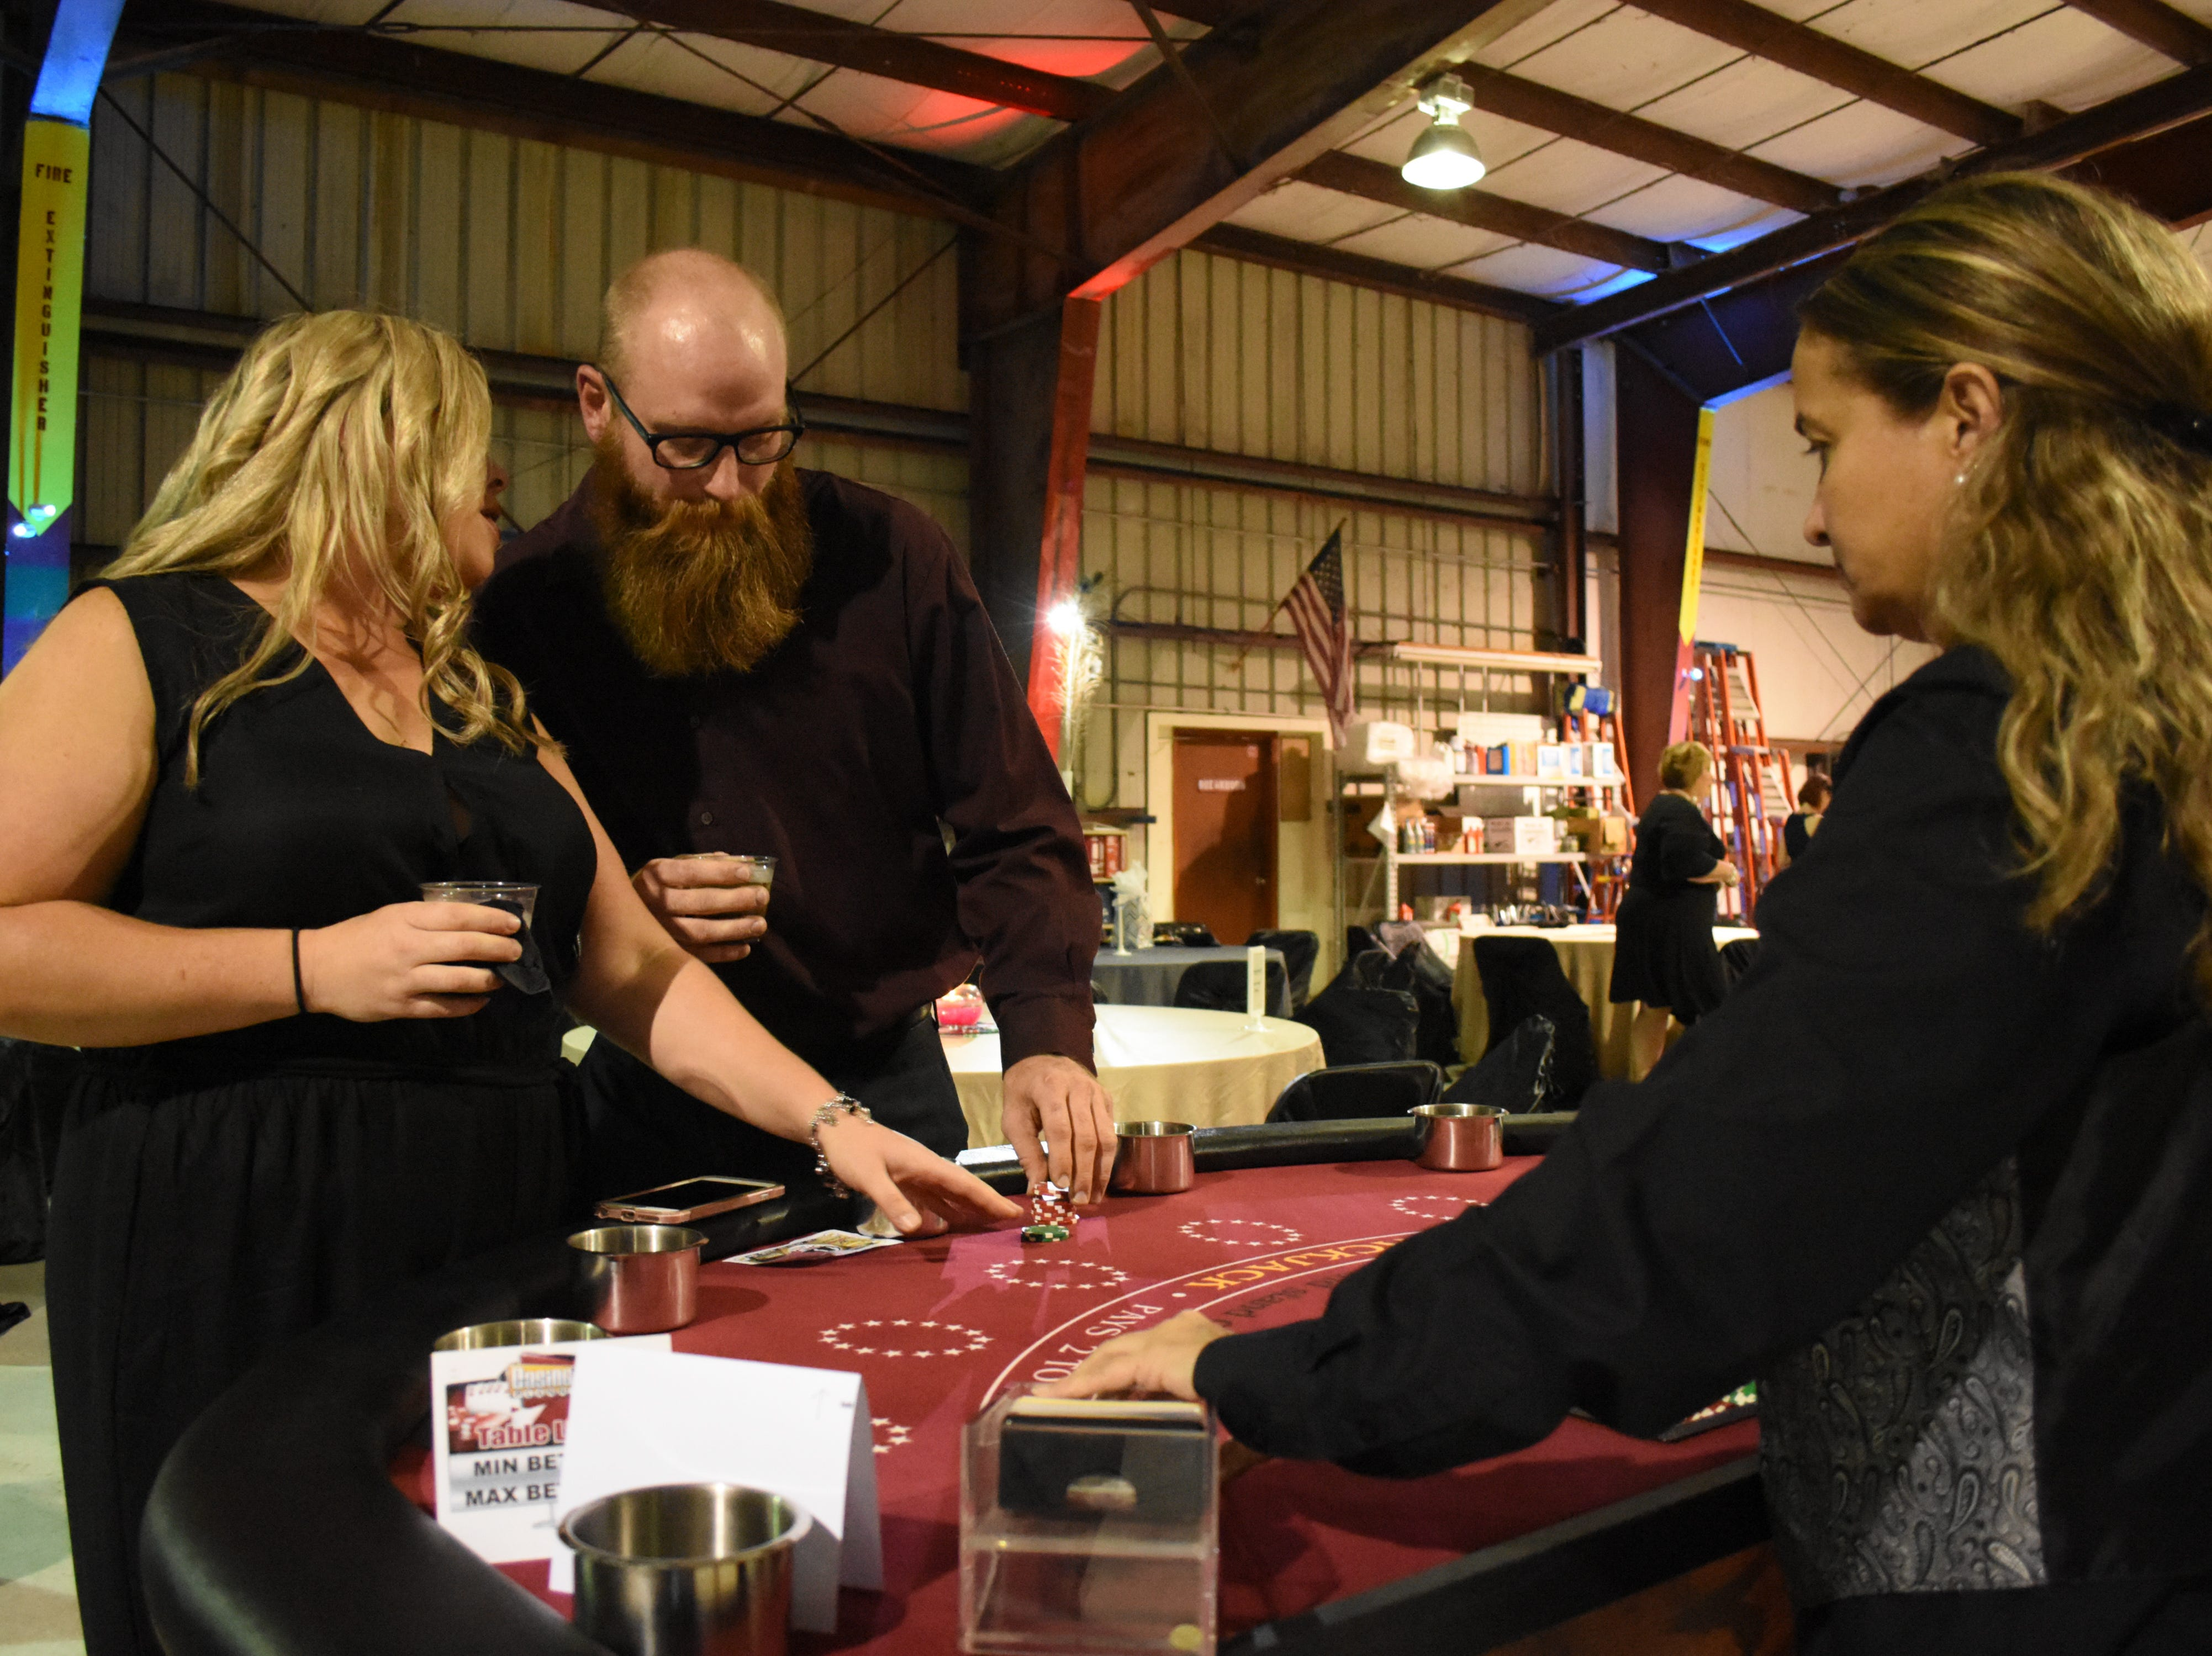 Amanda Tacinaand  Joshua Holton discuss strategy while playing blackjack.